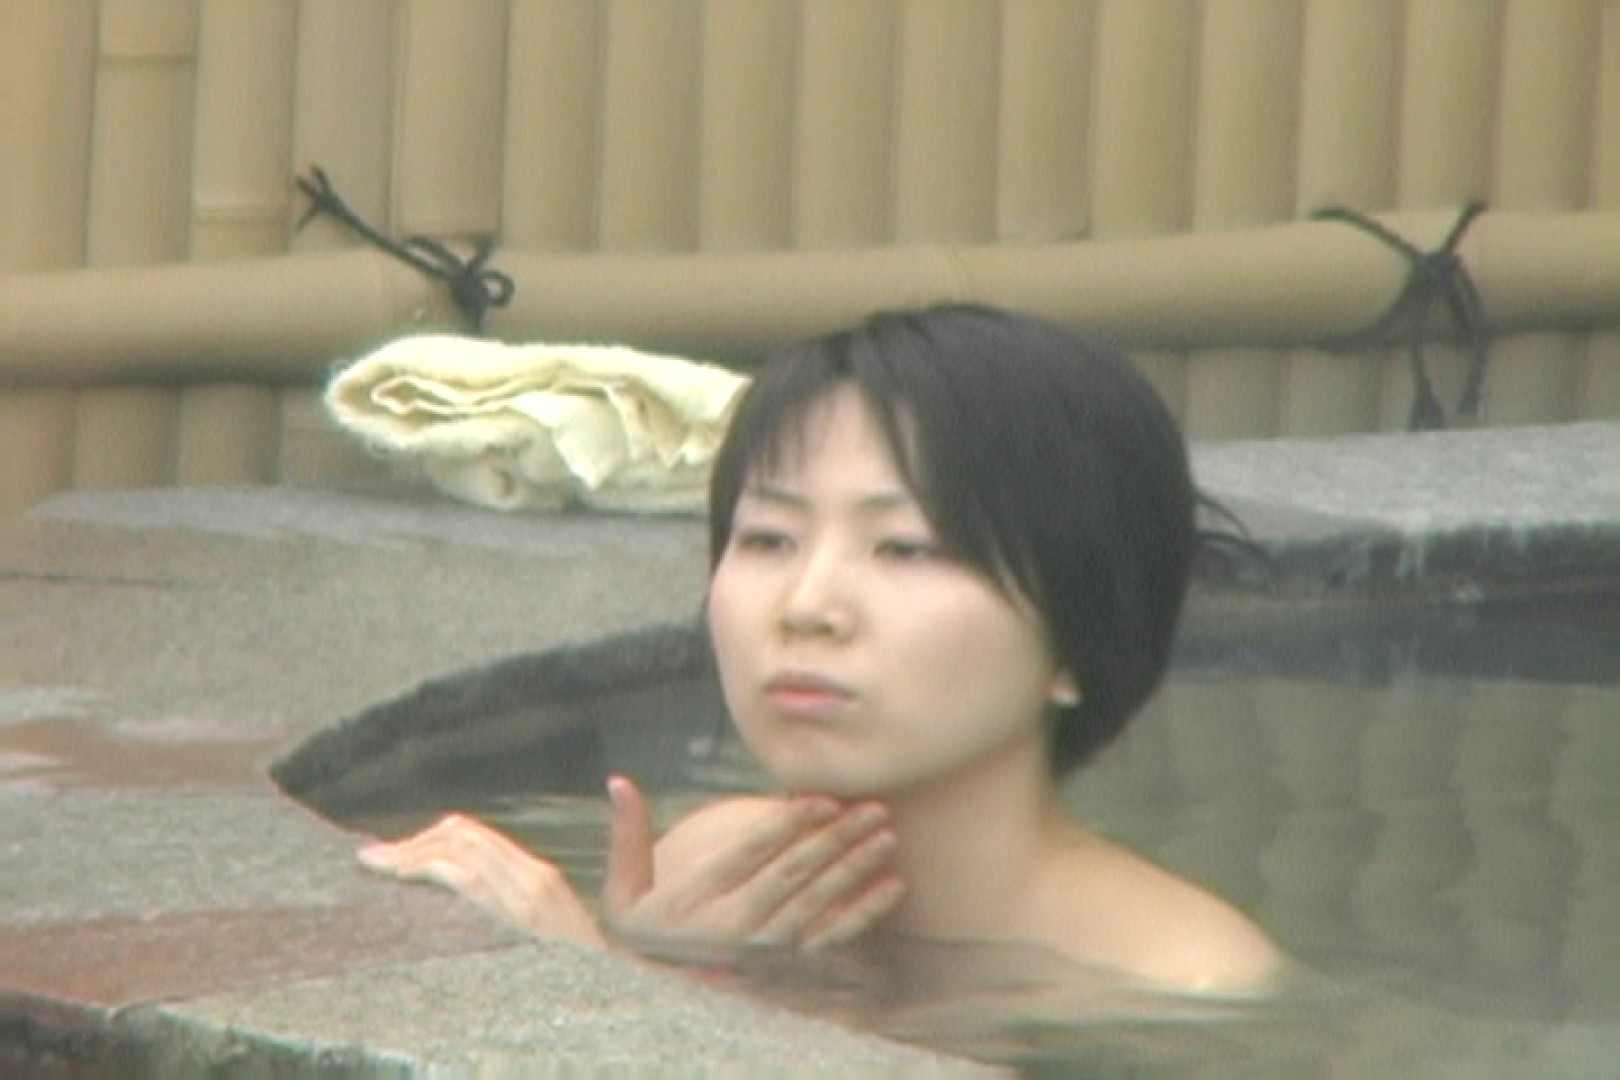 Aquaな露天風呂Vol.567 0  105連発 48